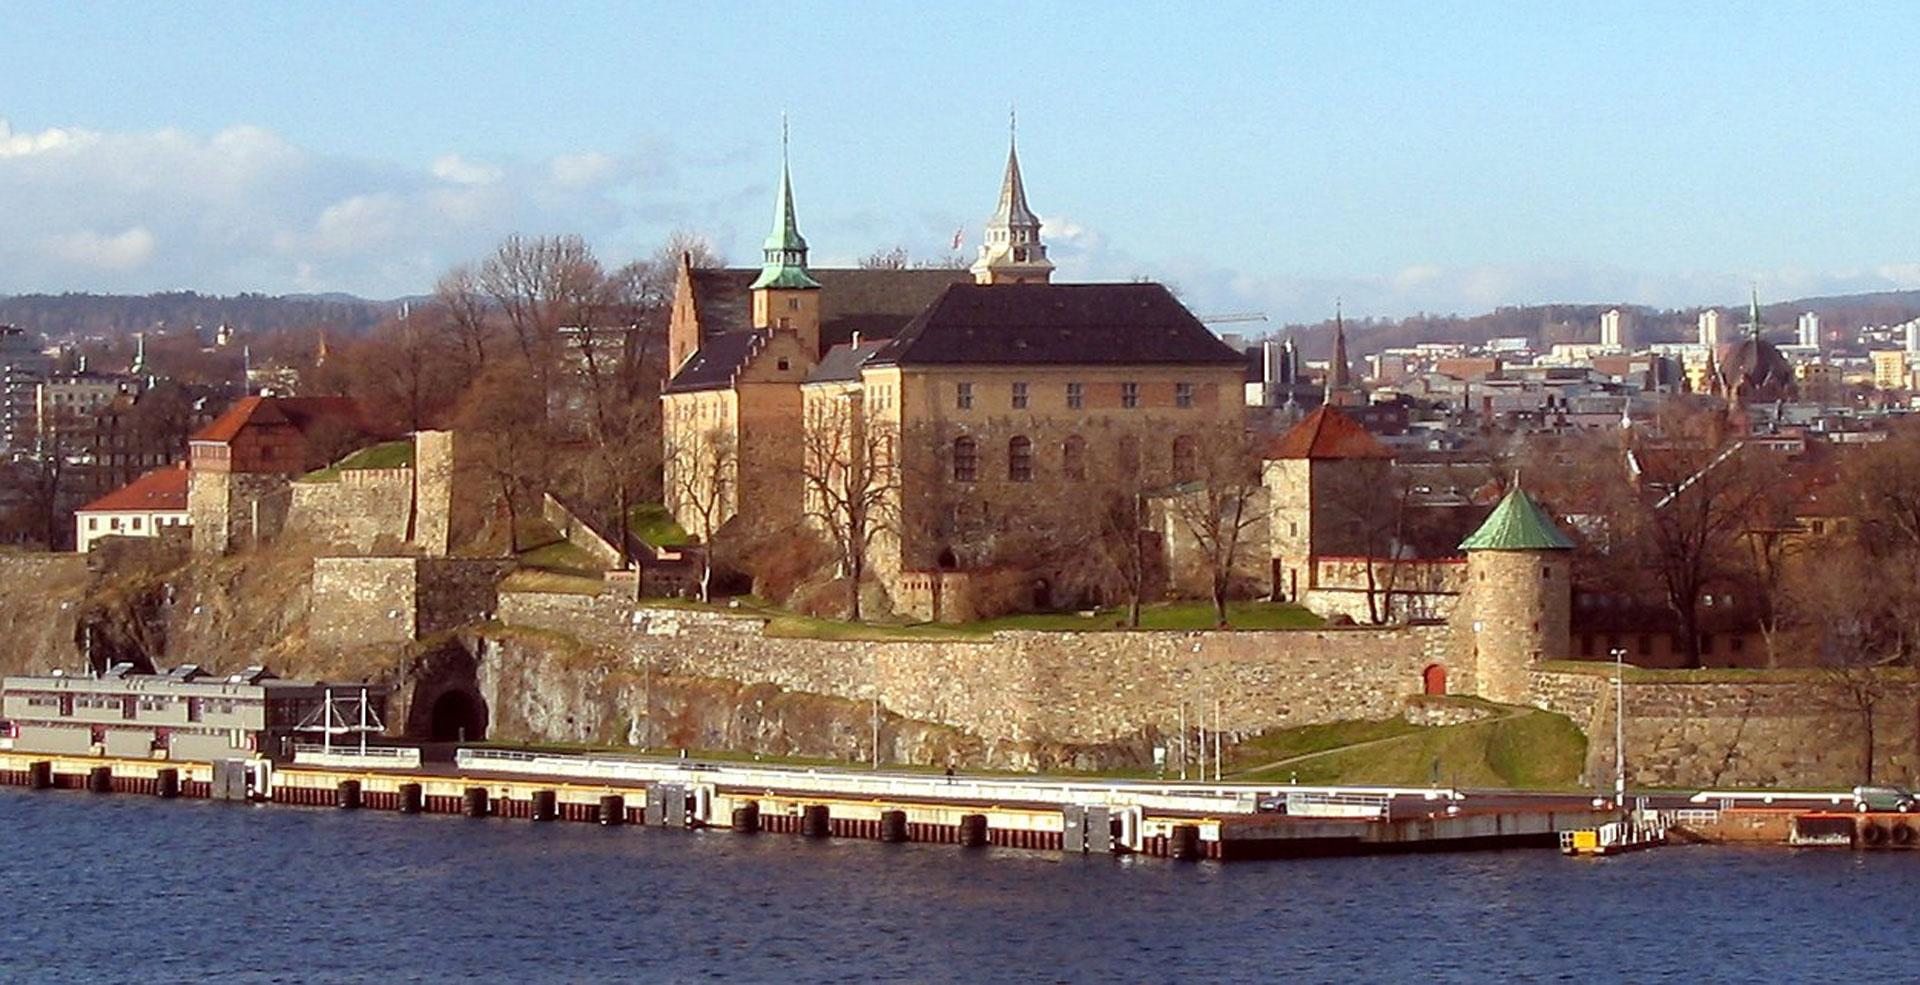 2019, oslo, akershus, castle, norvege